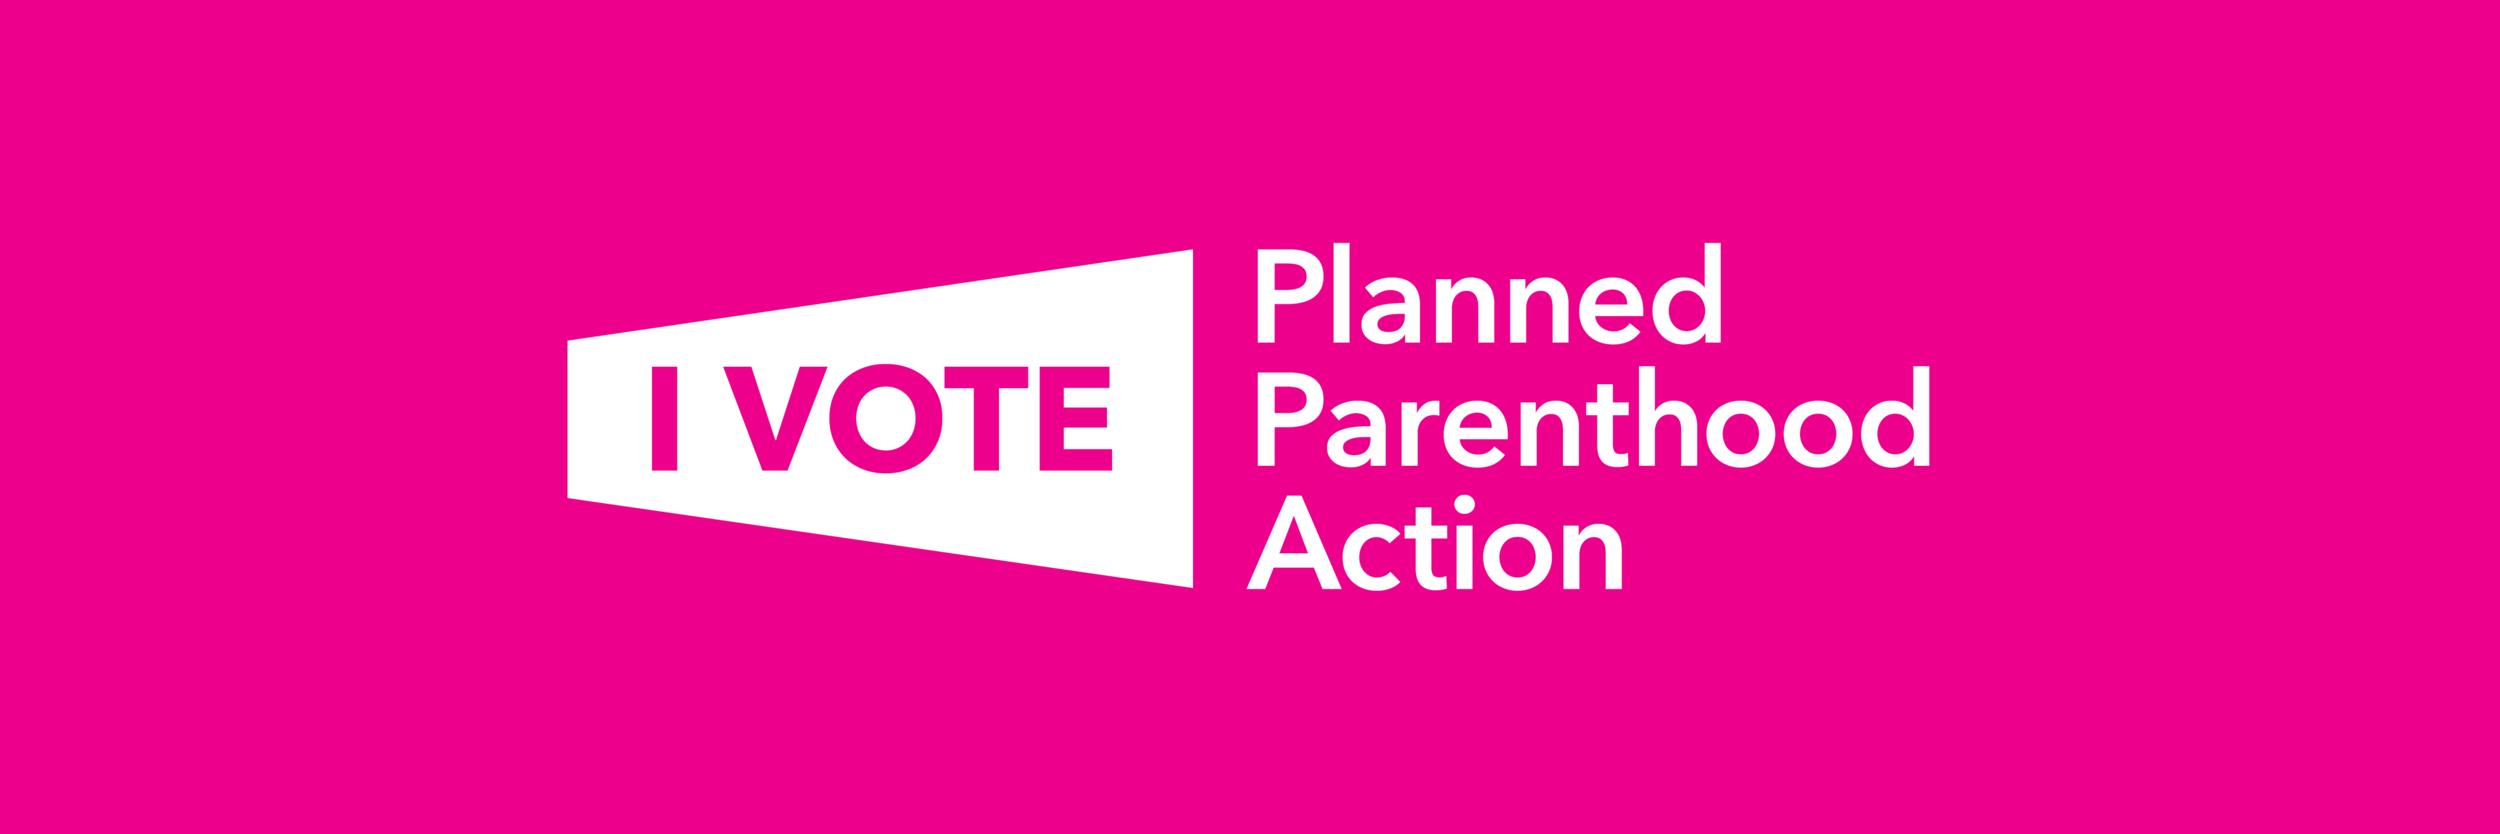 PDA_Planned_Parenthood_I_Vote